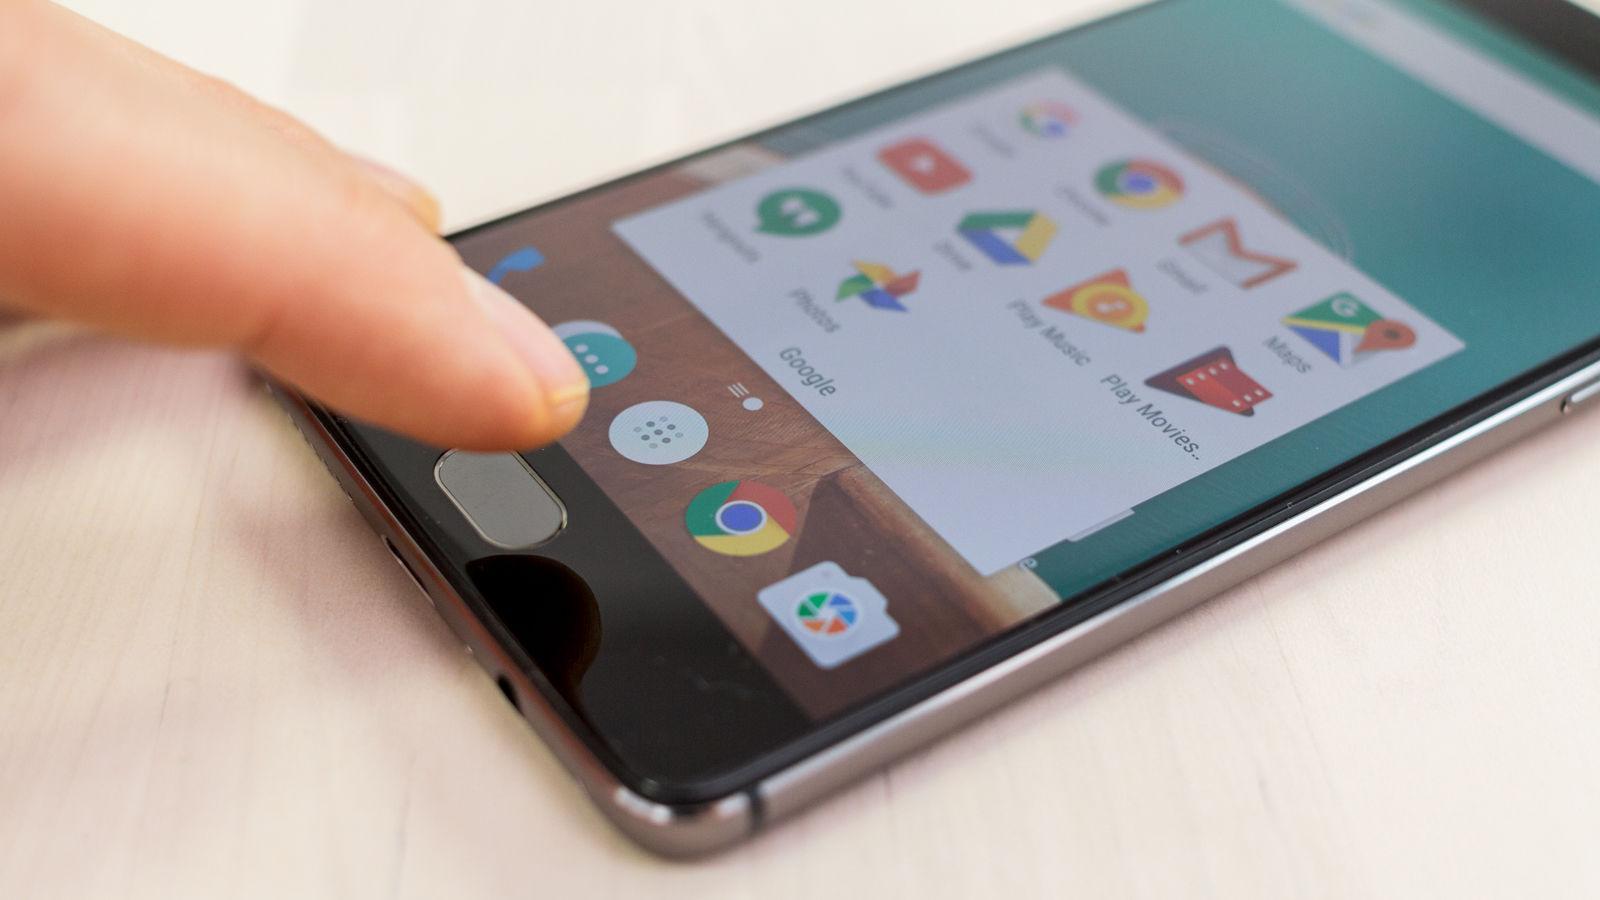 OnePlus 3 , OnePlus 3 Camera ,OnePlus 3 Camera test,OnePlus 3 display Glass Replace, OnePlus 3 Camera, OnePlus 3 Camera glass